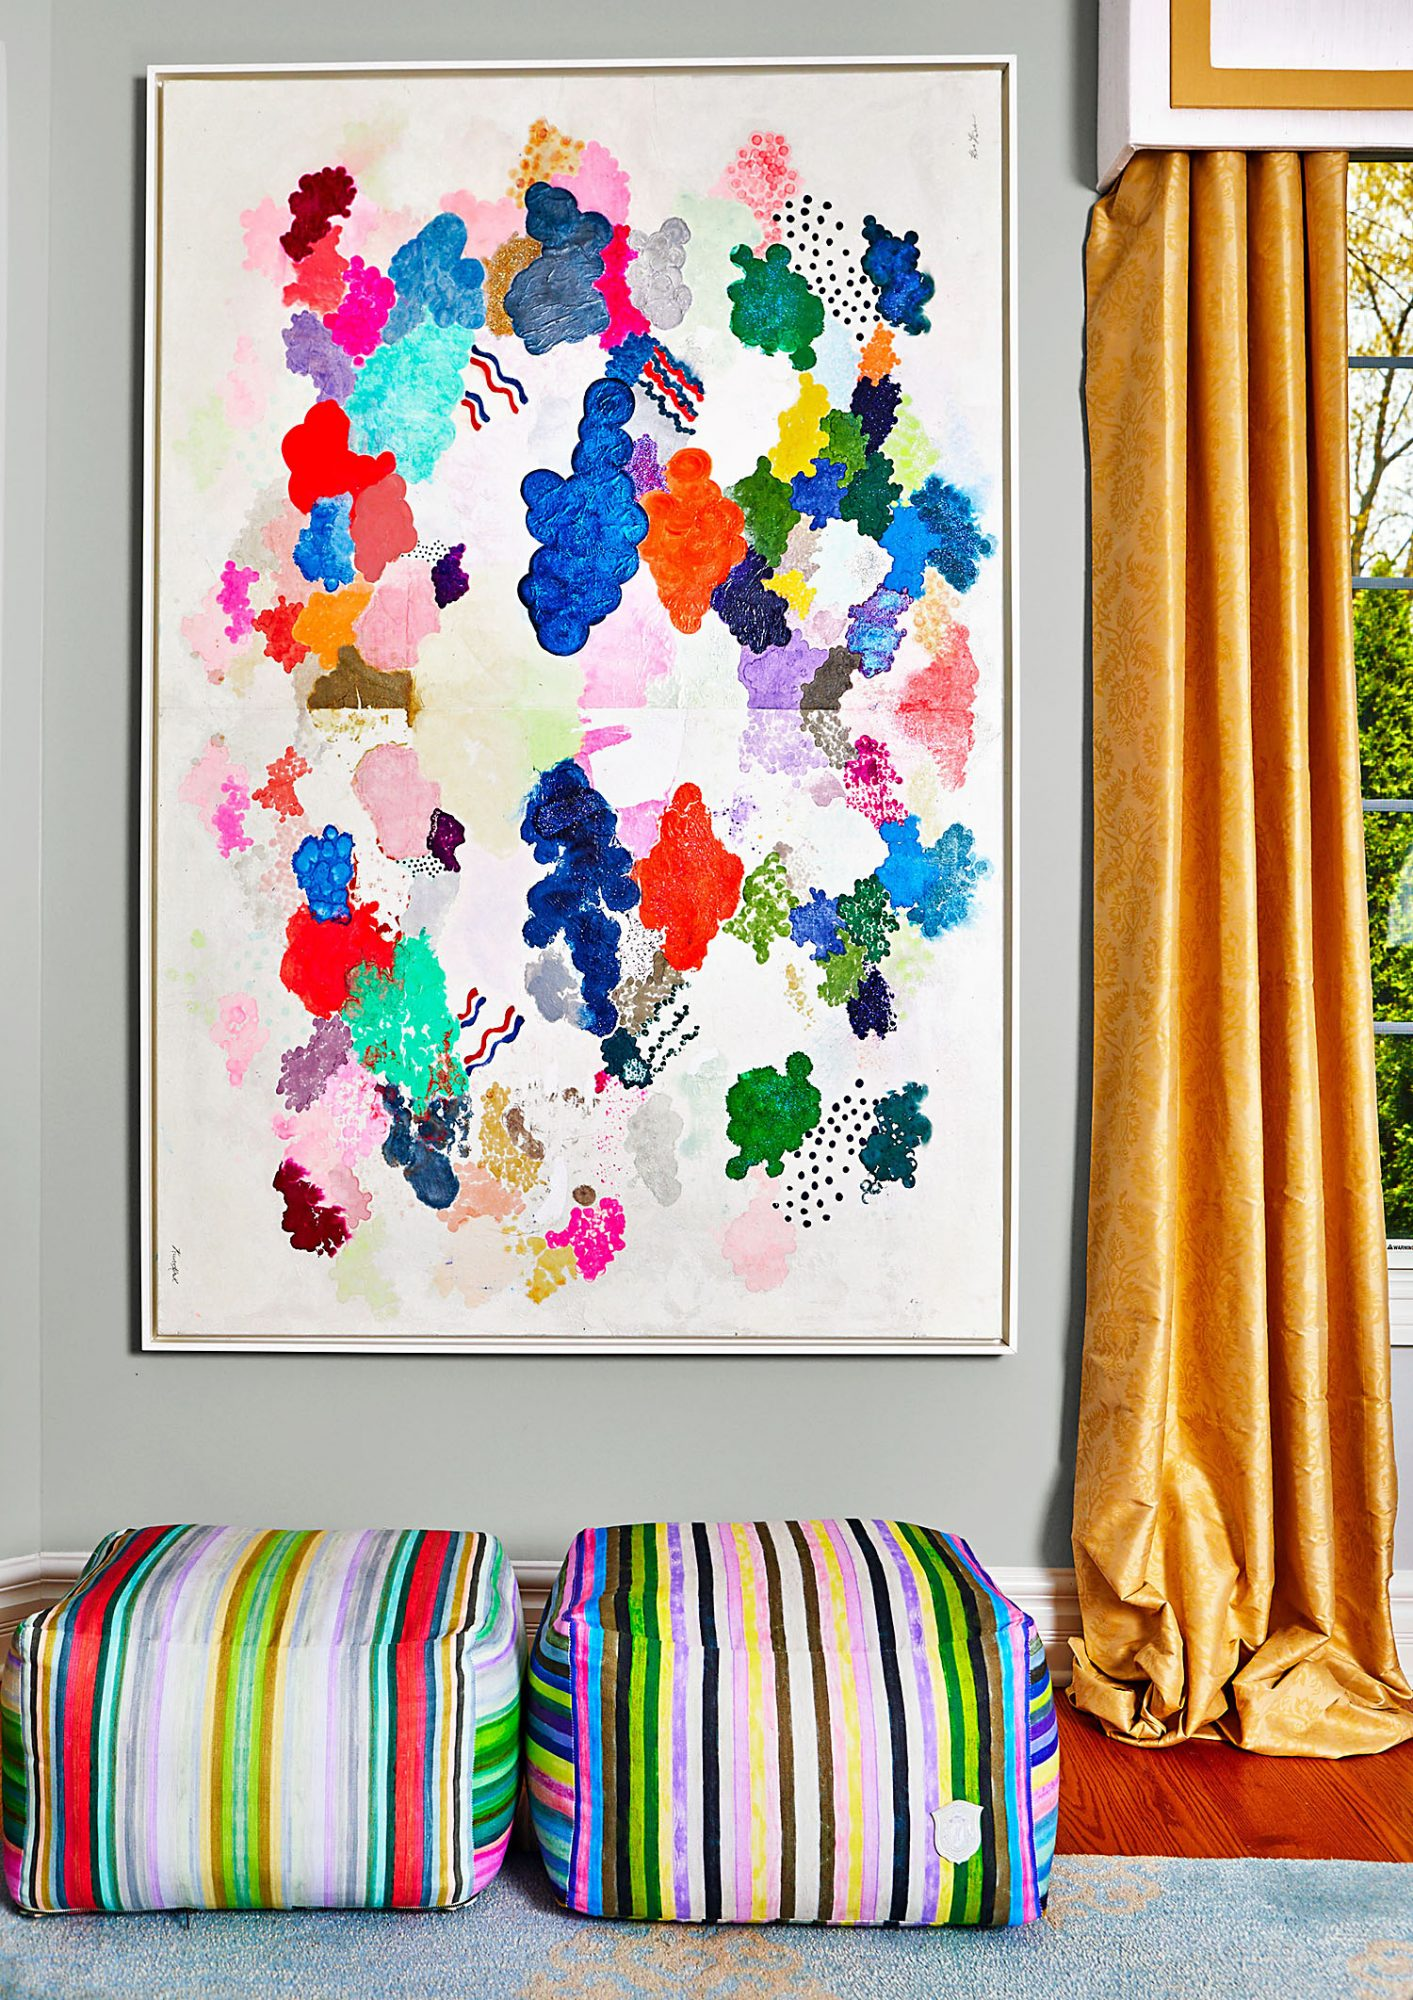 Kristi Kohut's framed artwork and colorful poufs